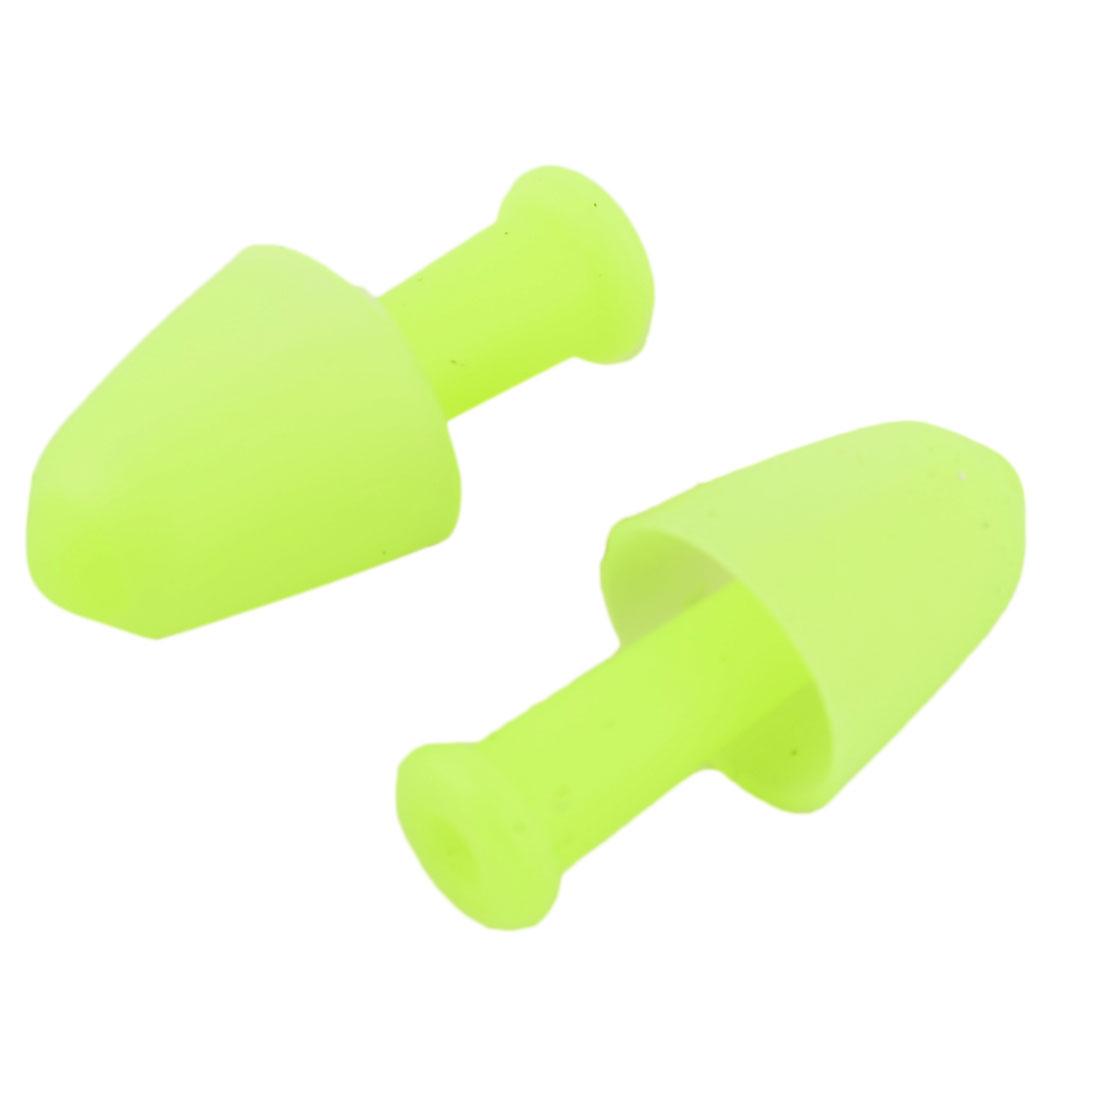 Adult Soft Silicone Swimming Waterproof Earplug Ear Protector Teal Pair